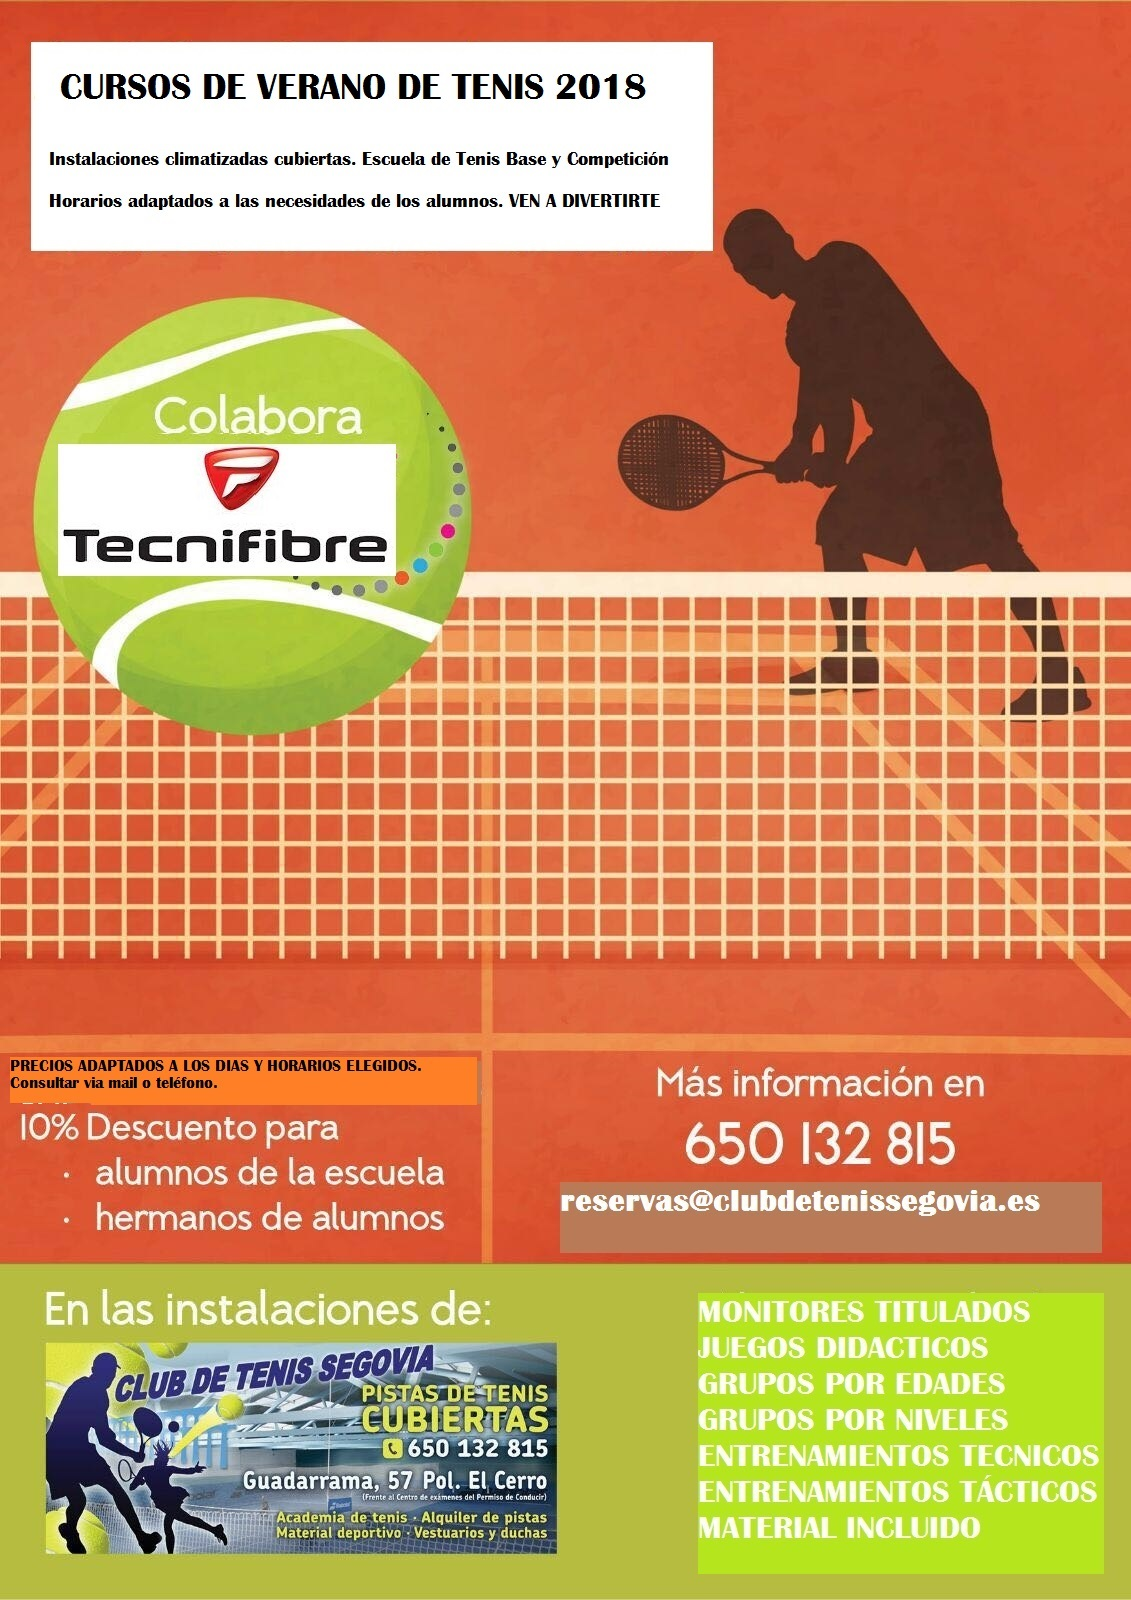 Club Tenis Segovia: Cursos de verano